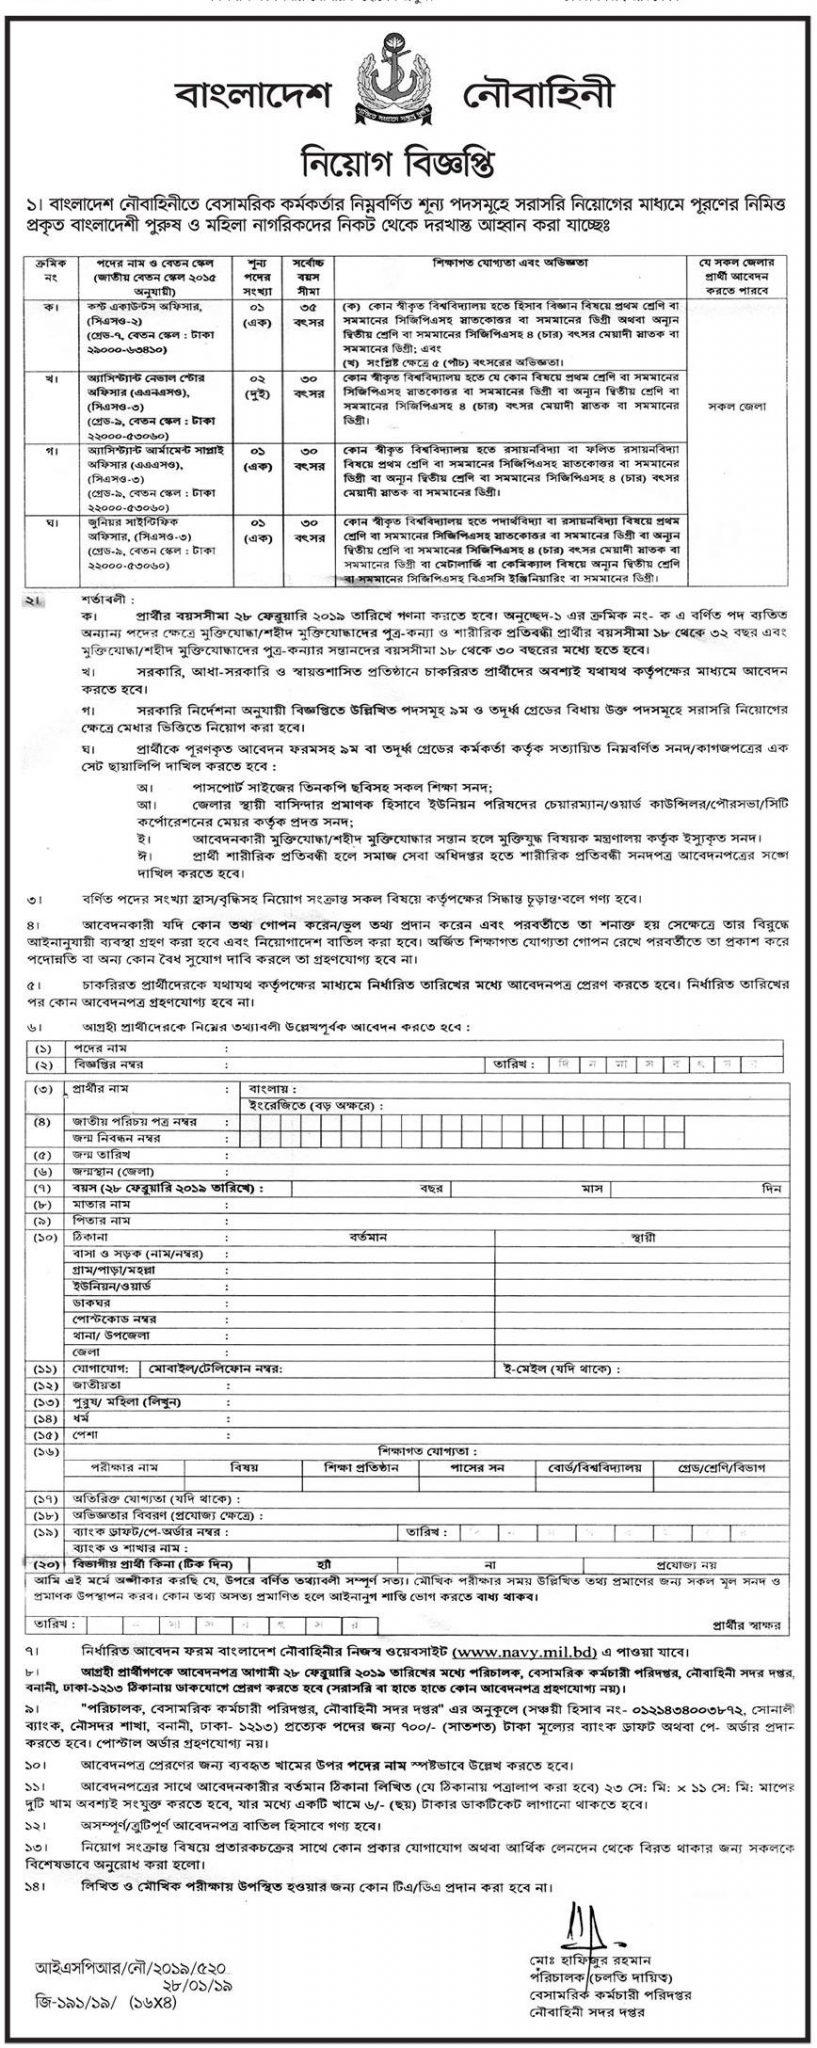 Bangladesh Navy Jobs Circular 2019